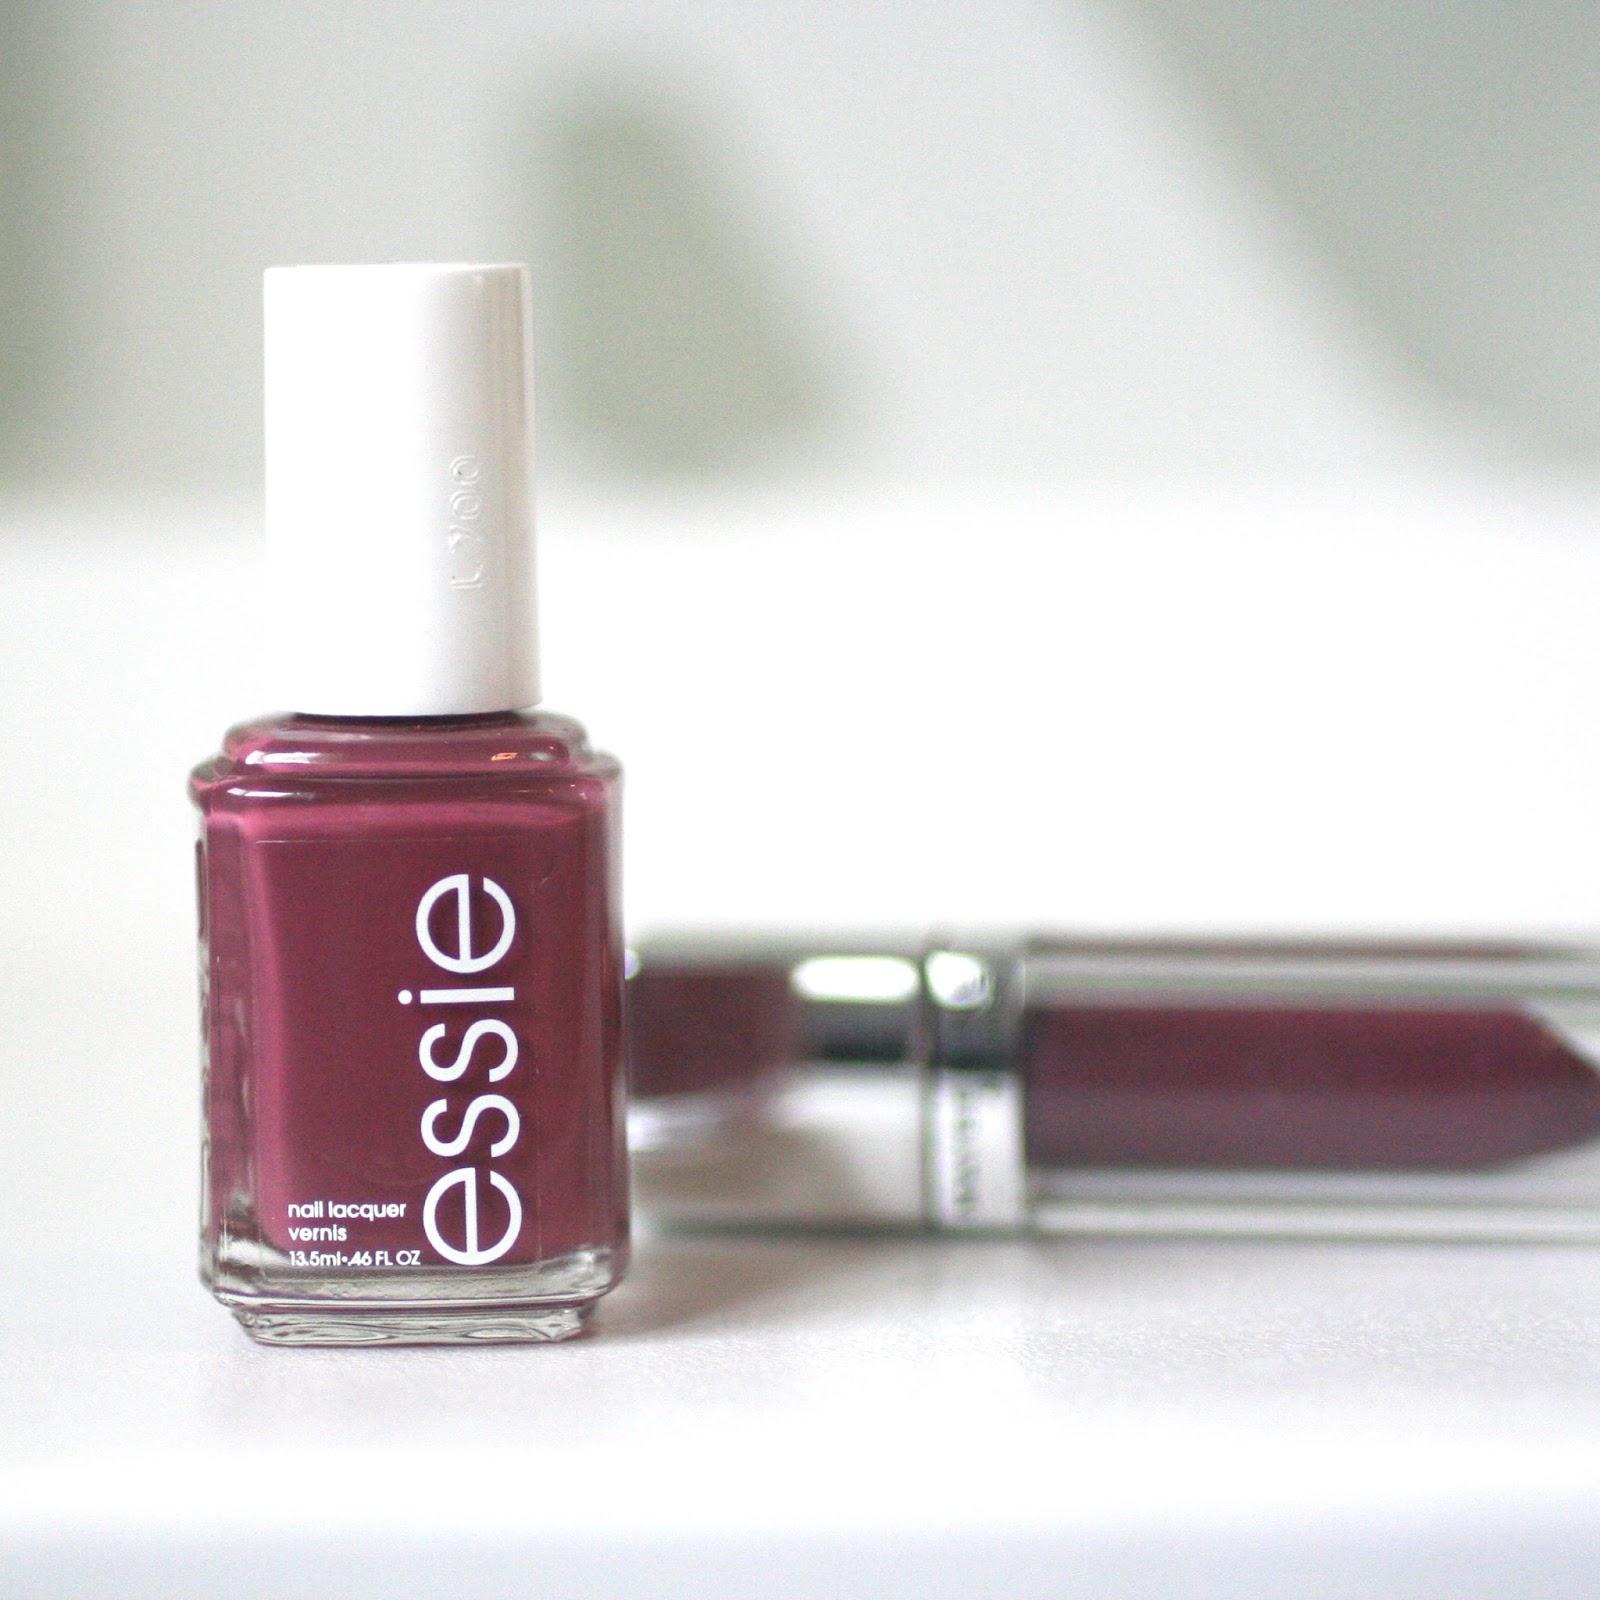 Essie Angora Cardi : Pantone Colour of the Year - Marsala | Essie Envy